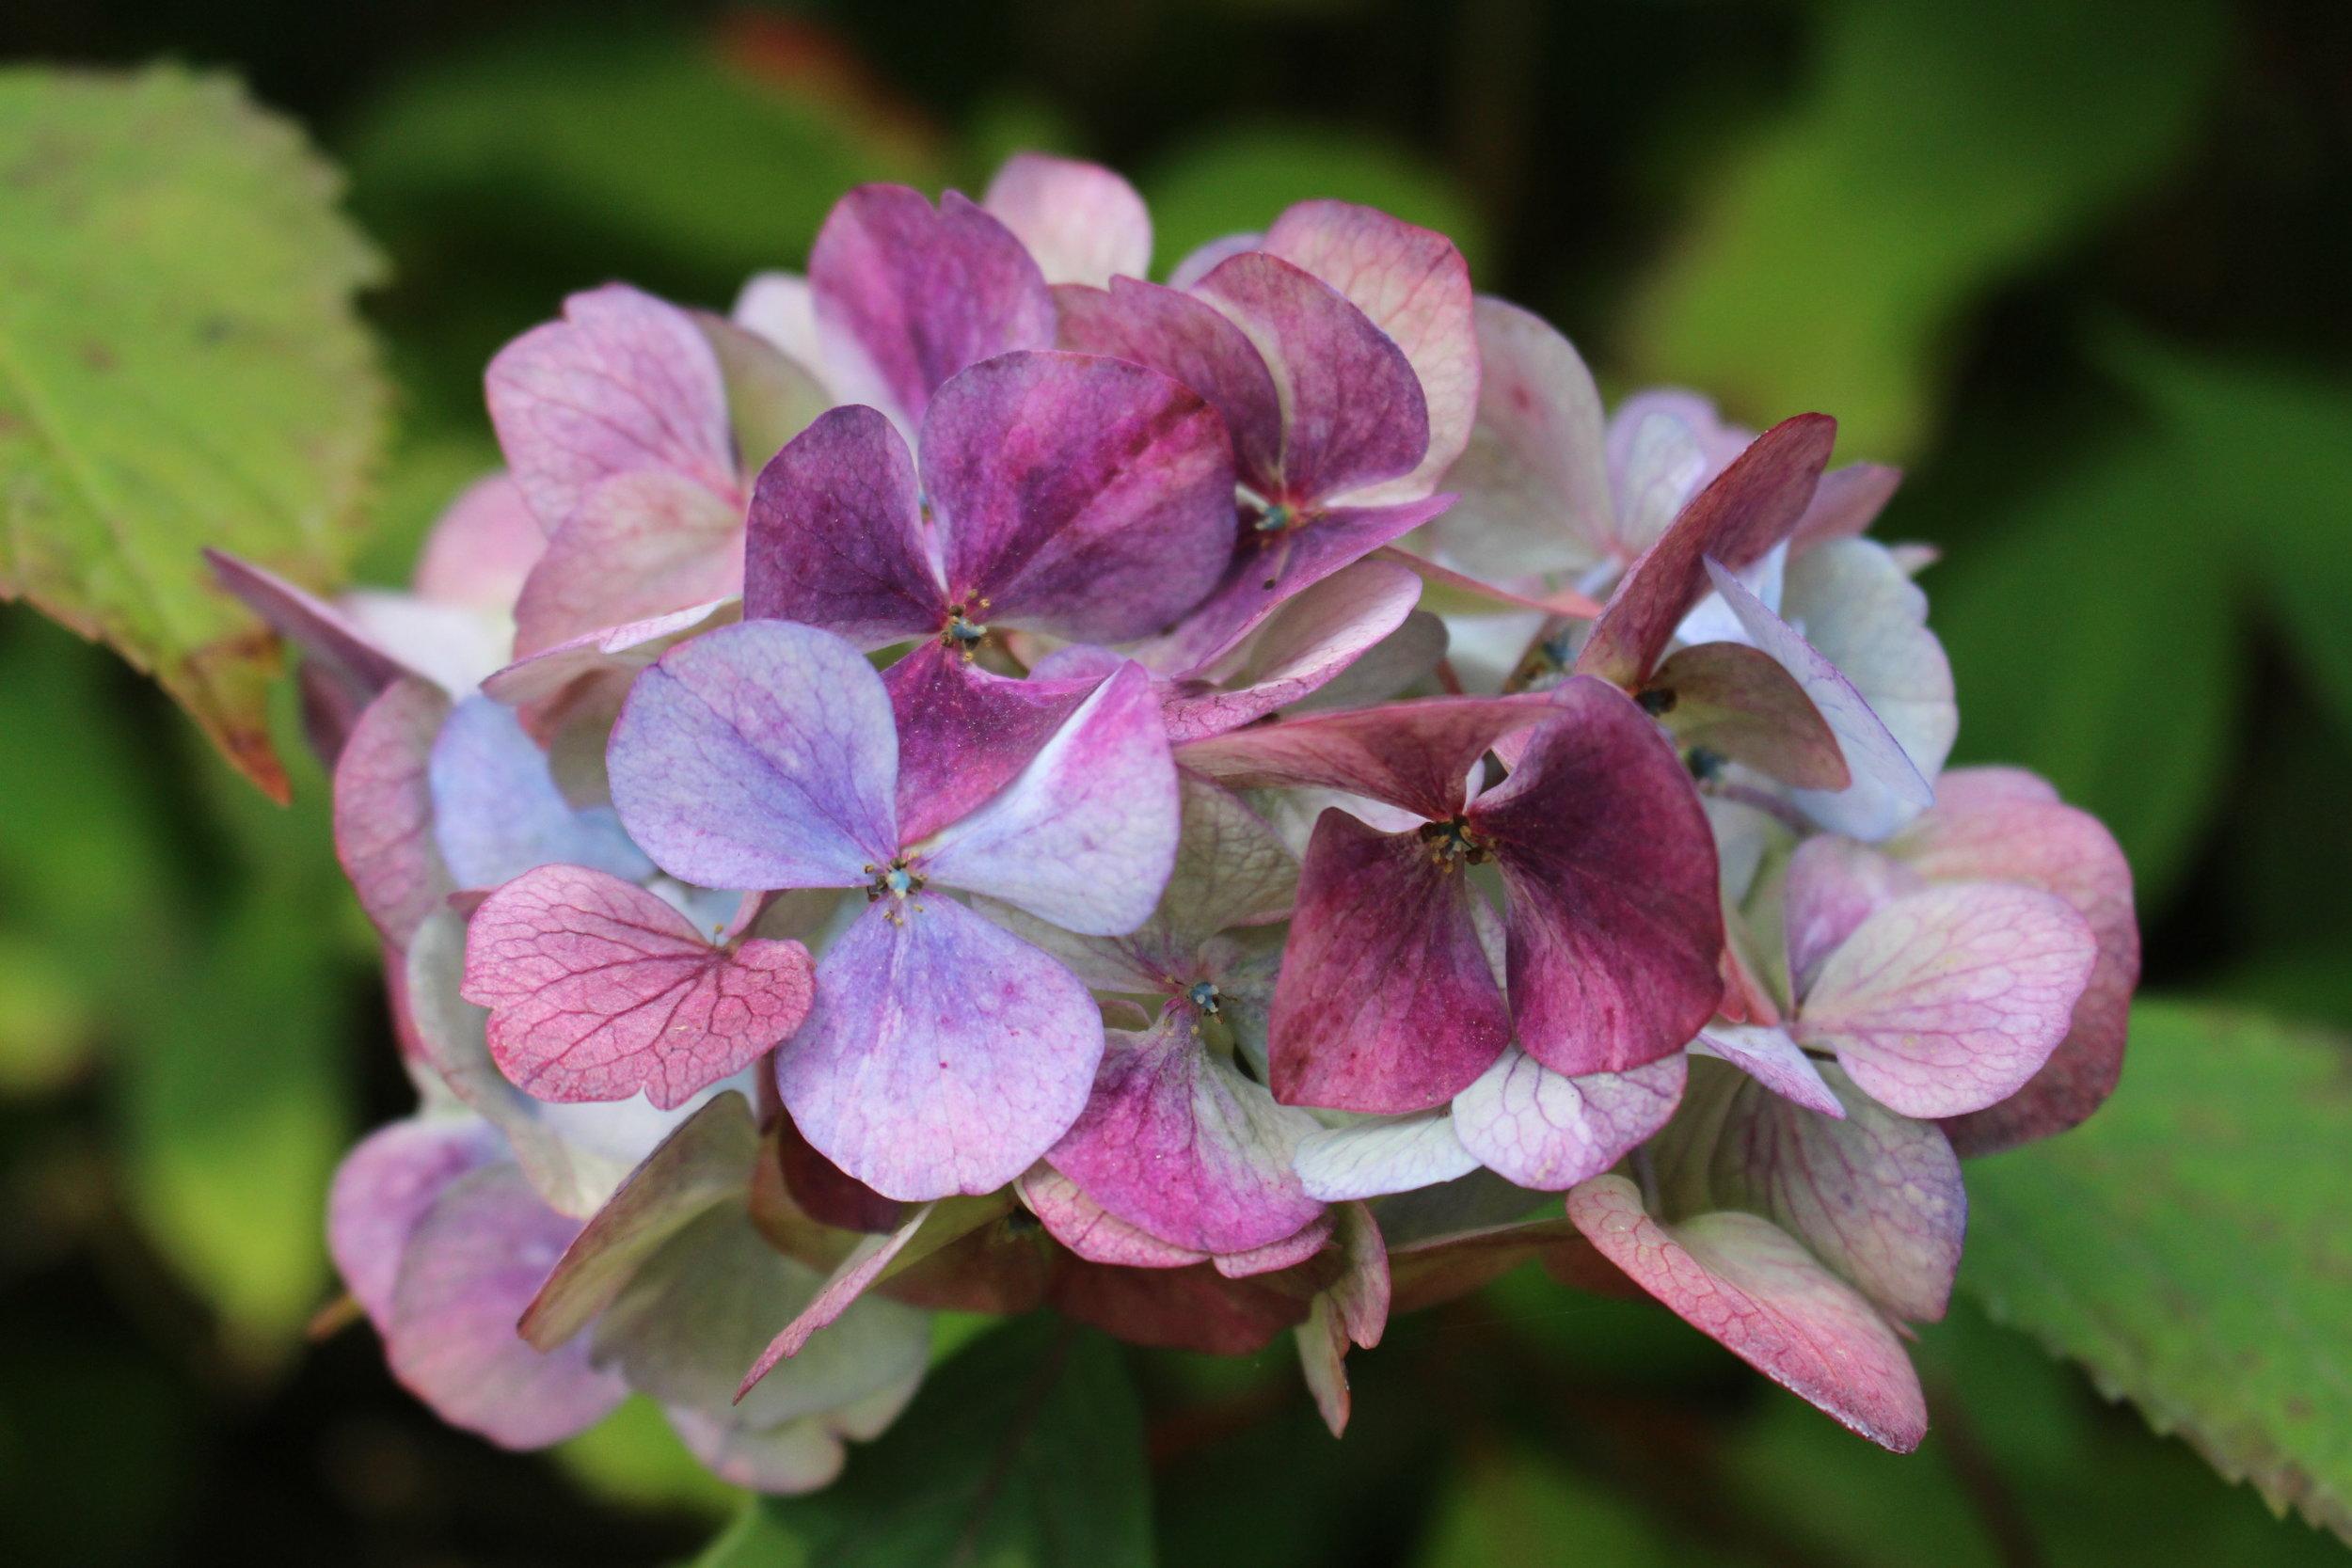 #124 Hydrangea, Hydrangea macrophylla